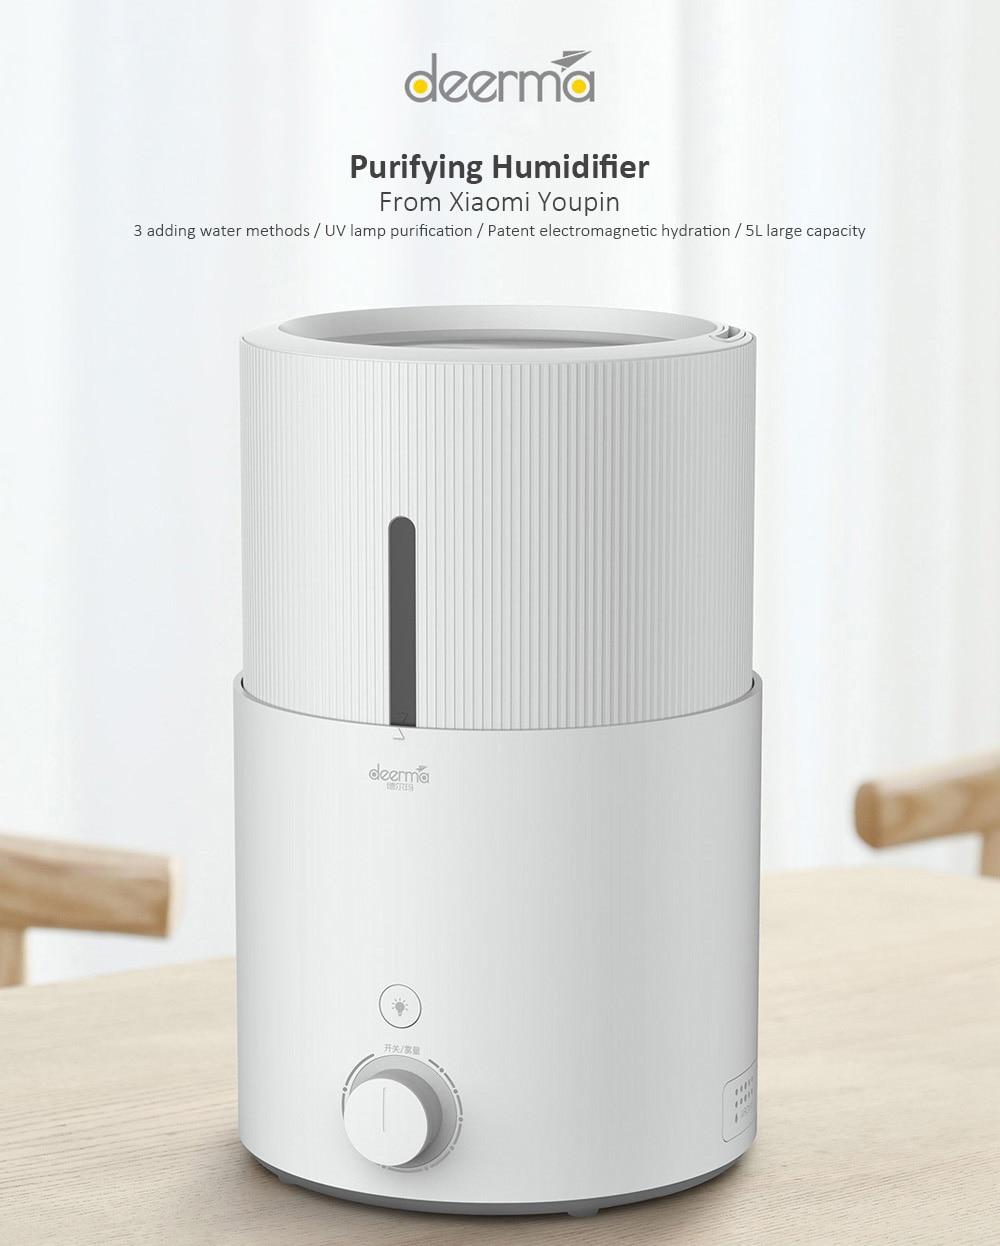 лучшая цена Original Xiaomi Mi Home Deerma DEM SJS600 Ultrasonic Air Humidifier Large 5L Capacity Purifying Humidifier Xiaomi Youpin